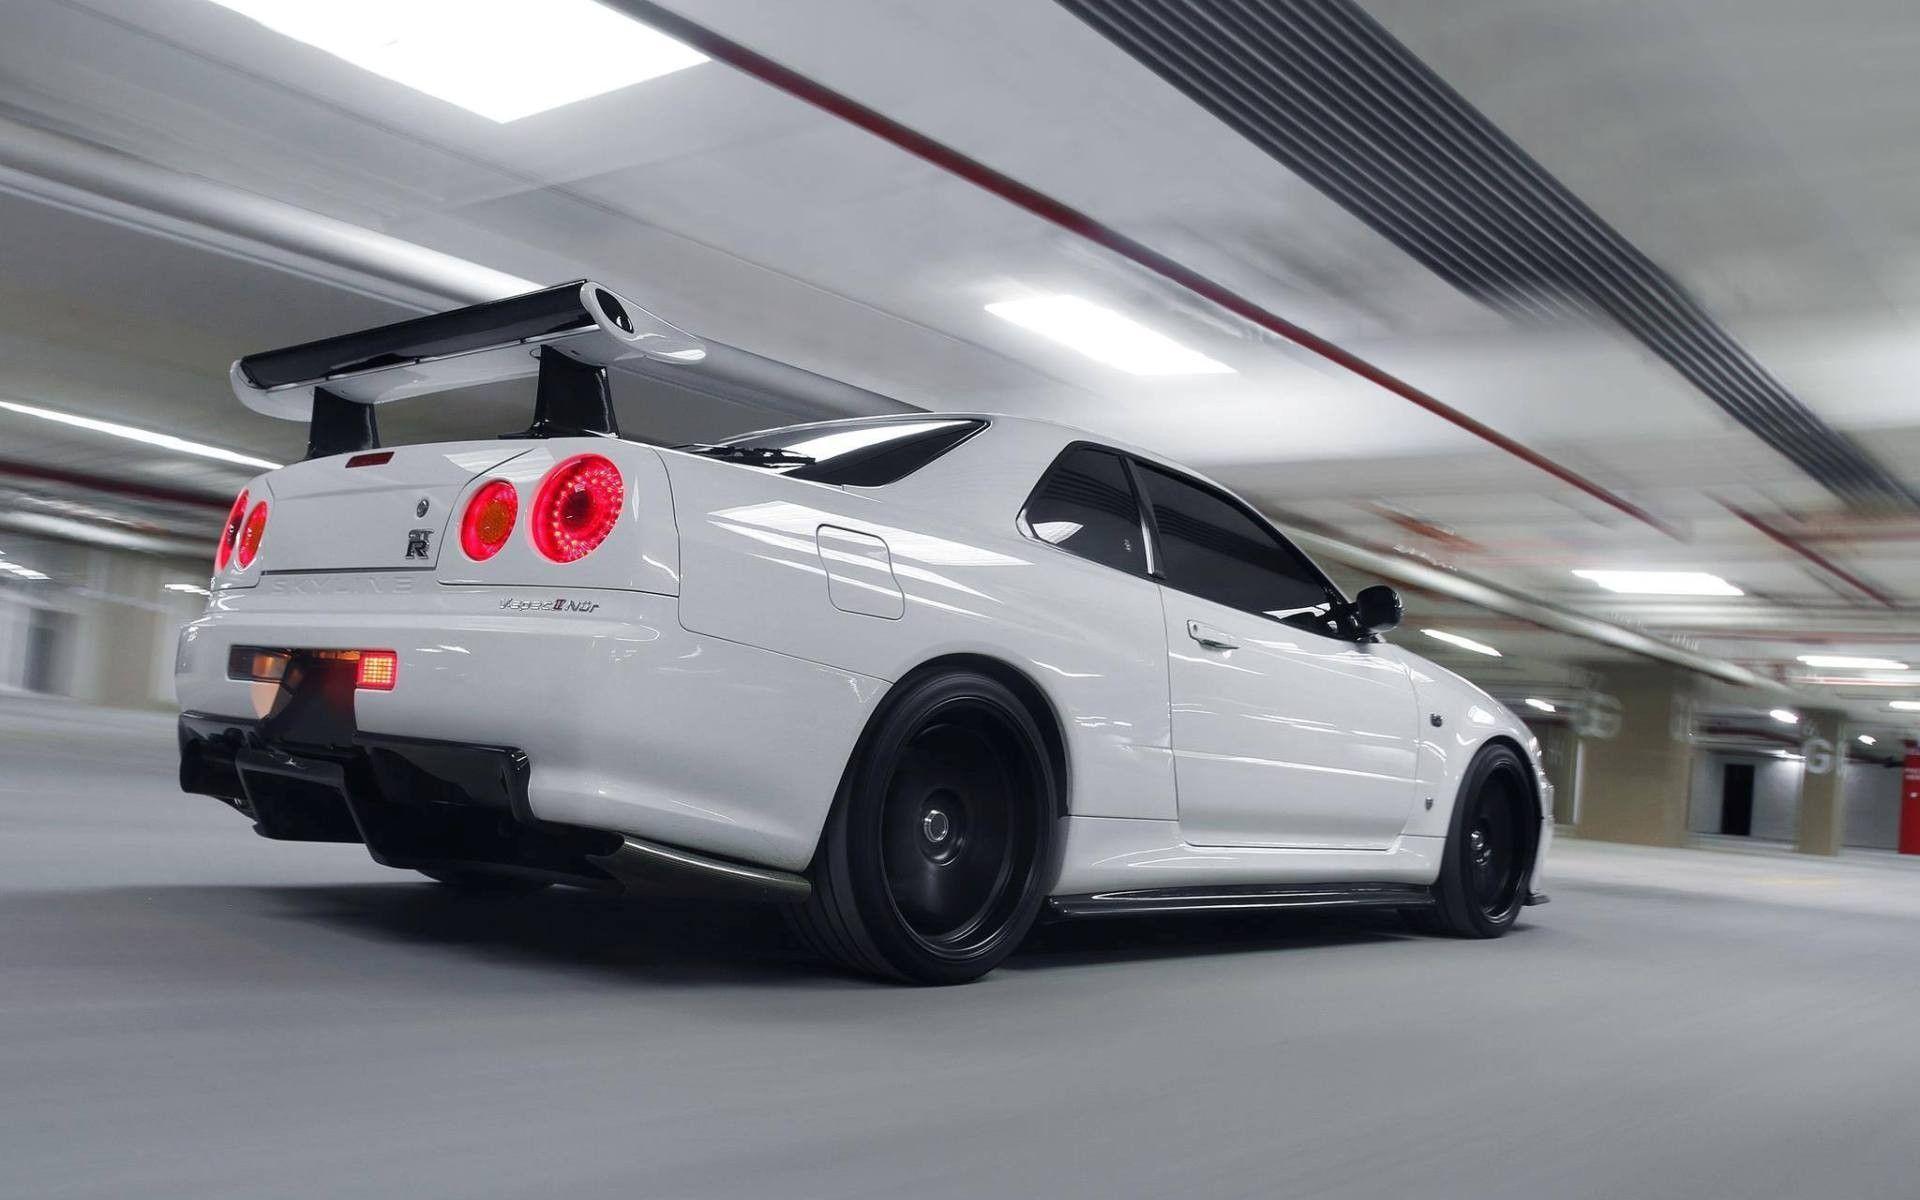 Nissan Skyline Gt R V Spec Ii Nissan Skyline Gt R Nissan Jdm Cars Wallpaper